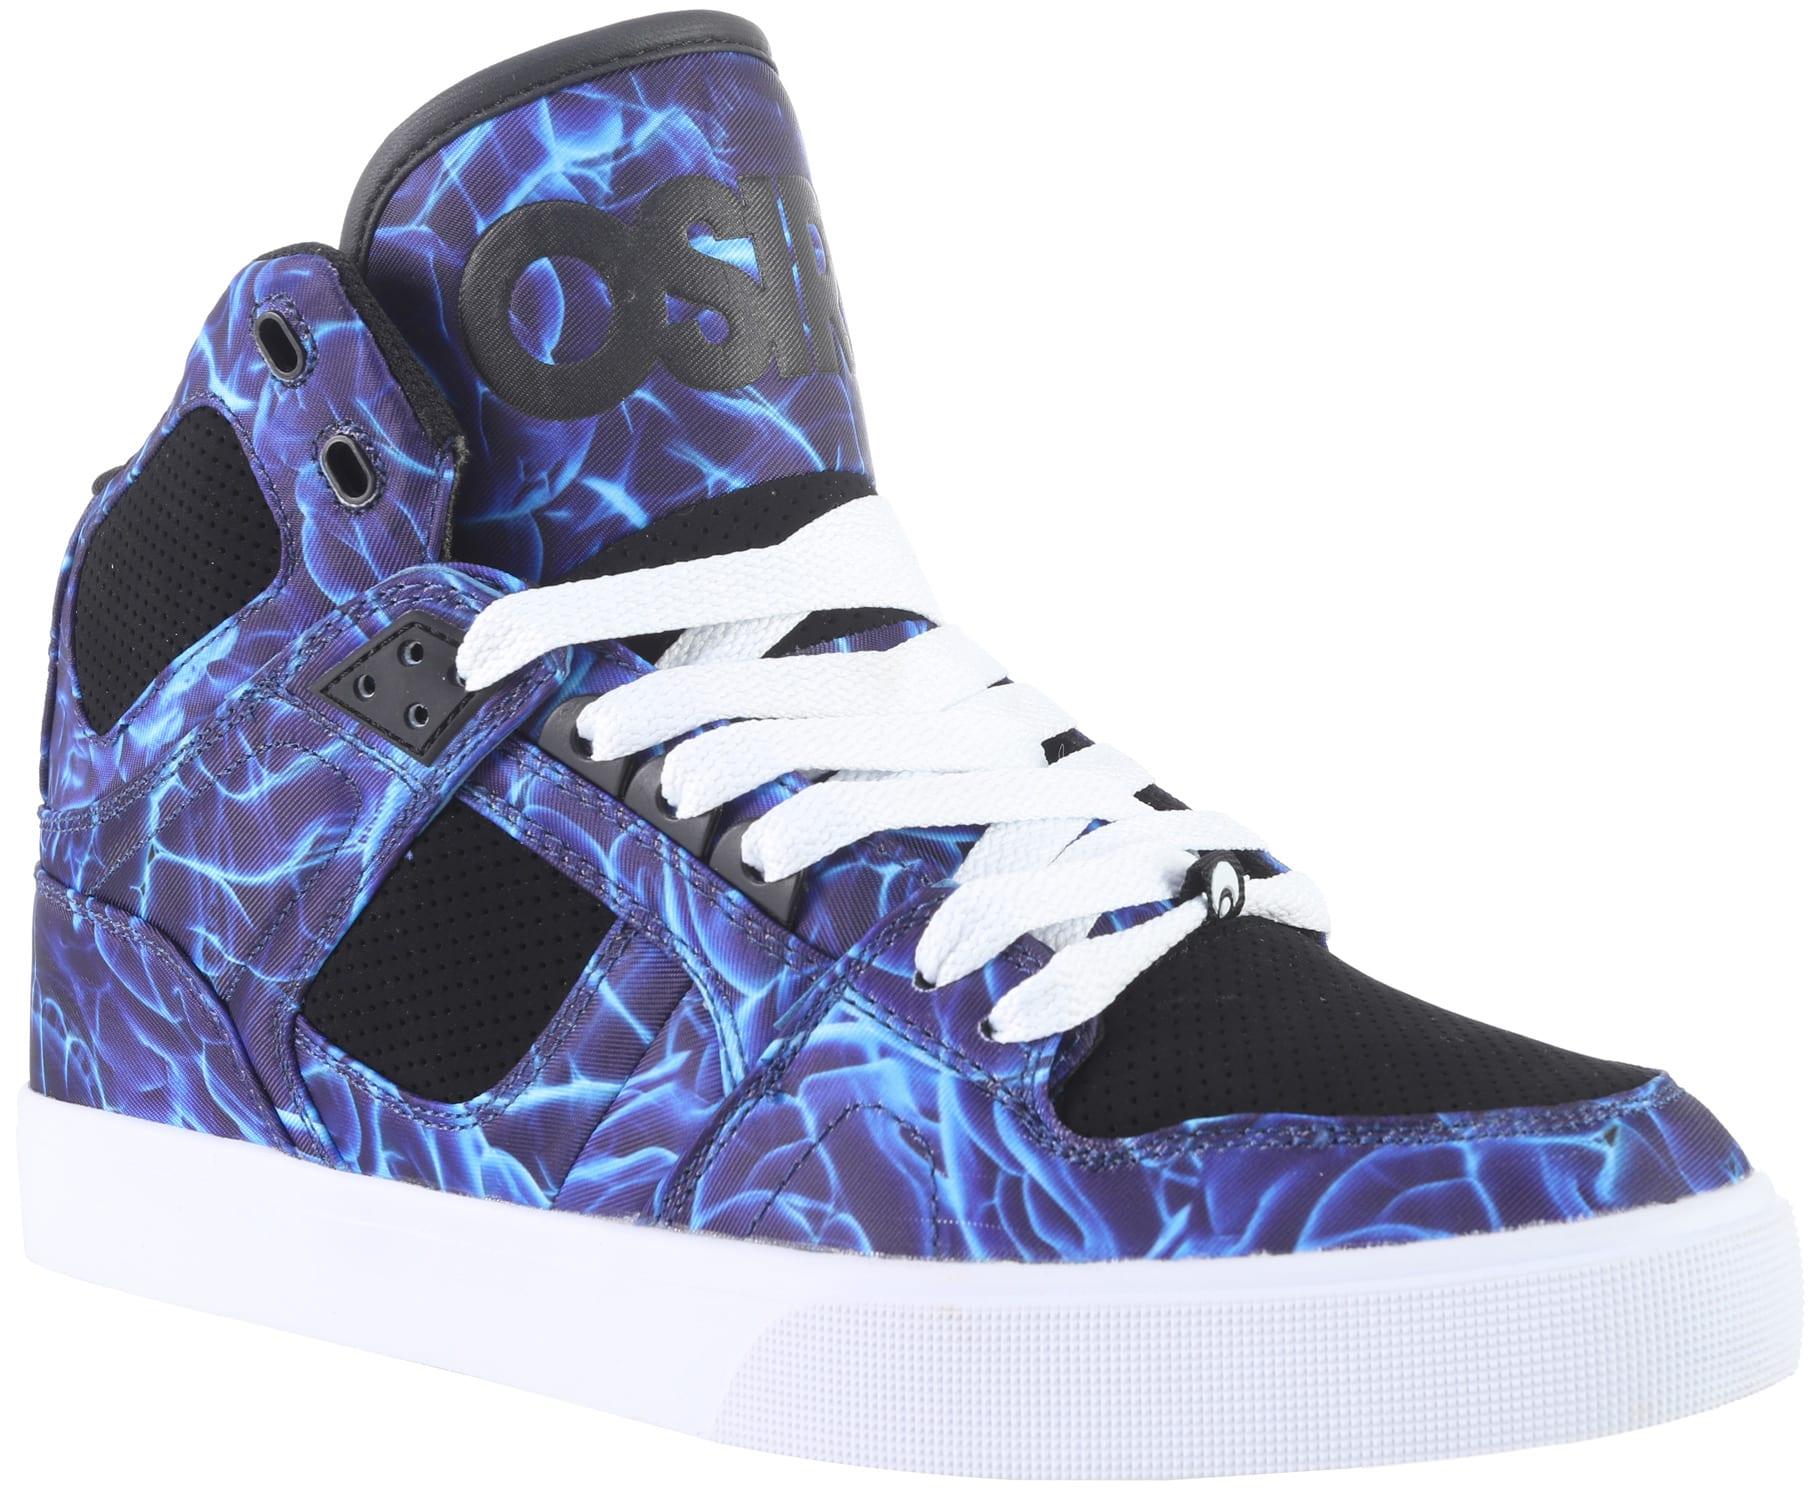 b3dd4a6af90 Osiris NYC 83 Vulc Skate Shoes - thumbnail 2